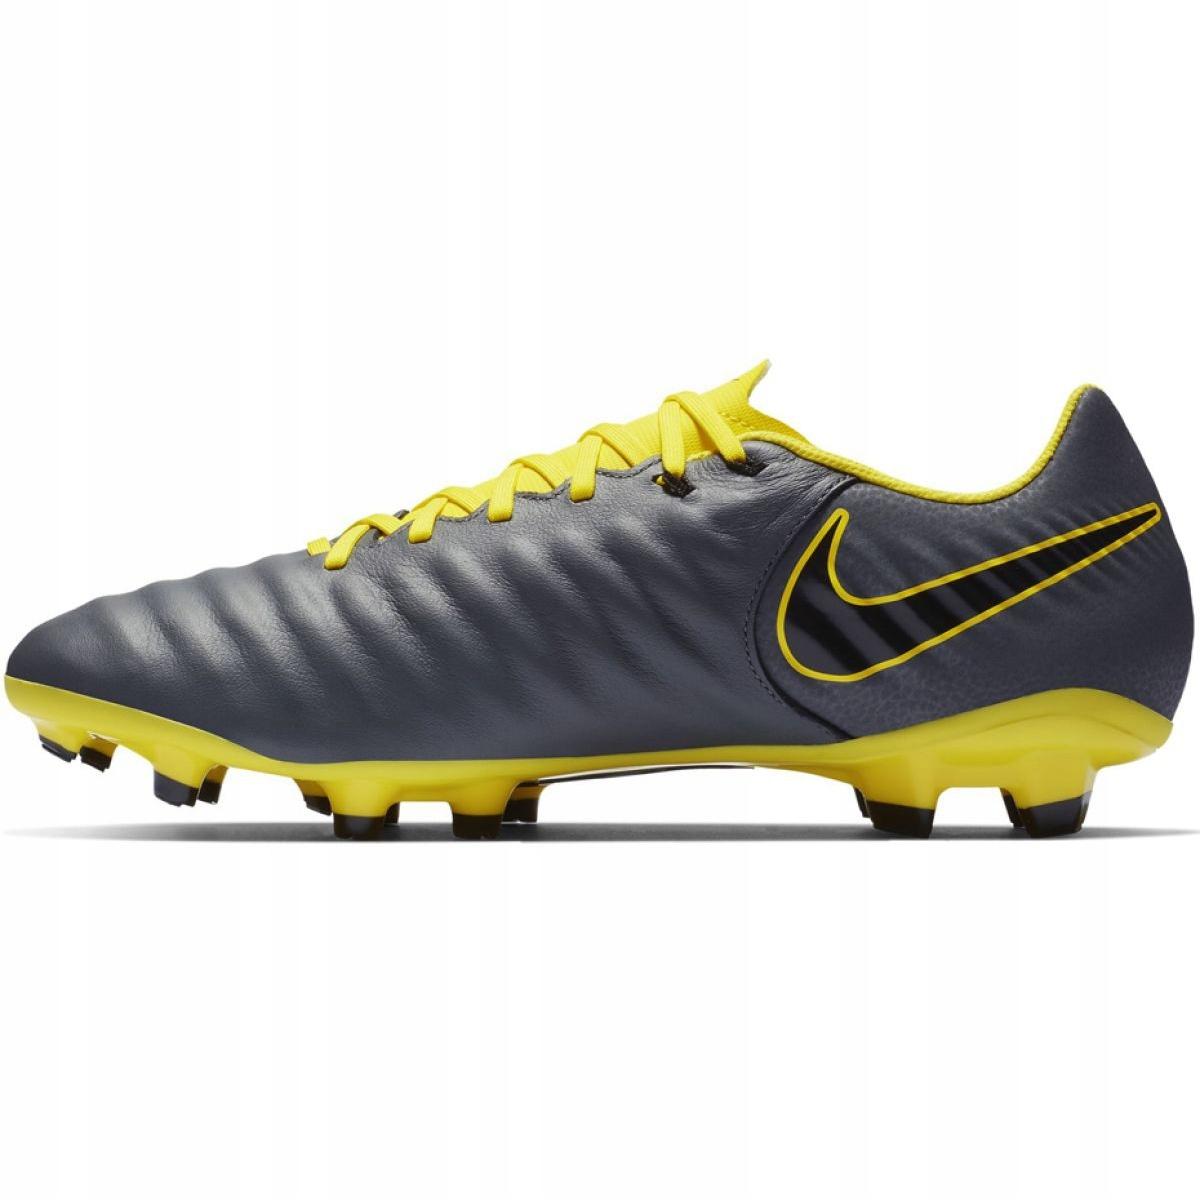 premium selection 24672 6f445 Football shoes Nike Tiempo Legend 7 Academy Fg M AH7242-070